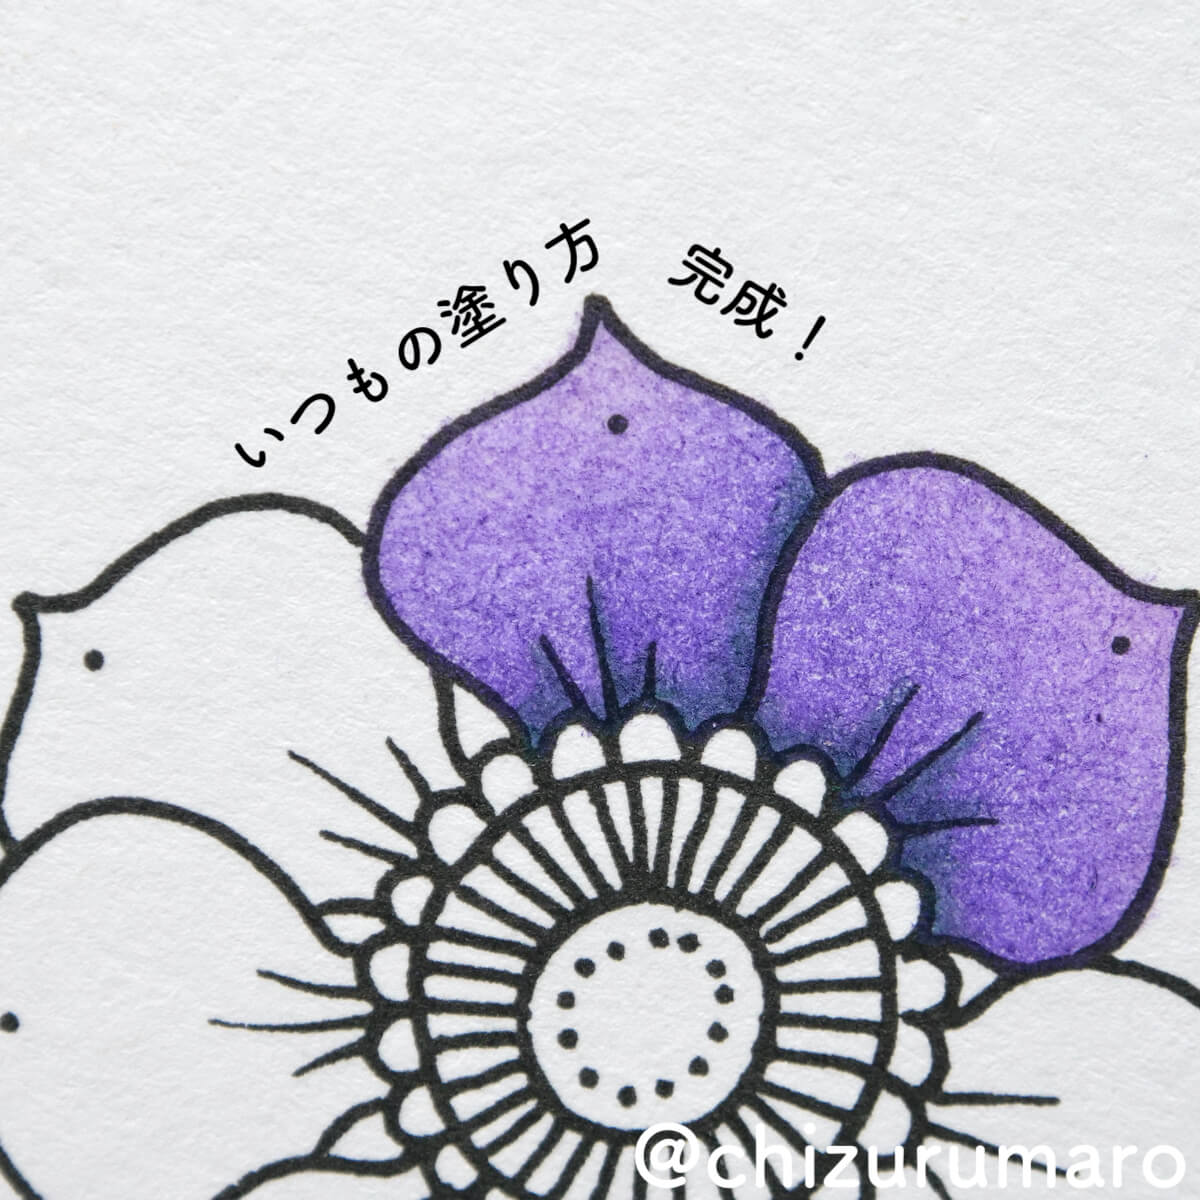 f:id:chizurumaro:20210805152837j:plain